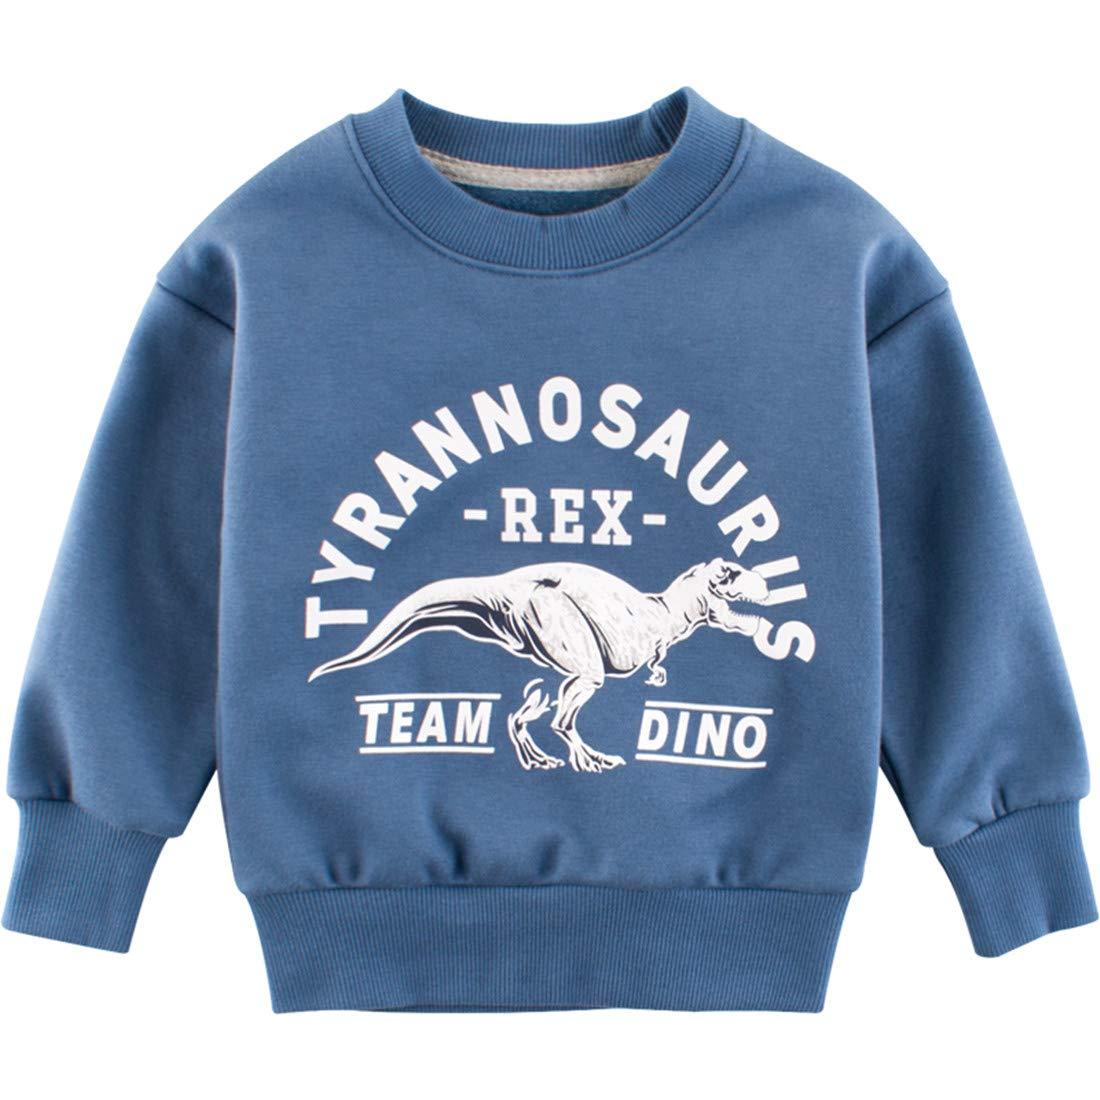 BTGIXSF Little Boys Dinosaur Sweatshirts Cotton Crewneck Long Sleeve Pullover Sweatshirts 1-7T